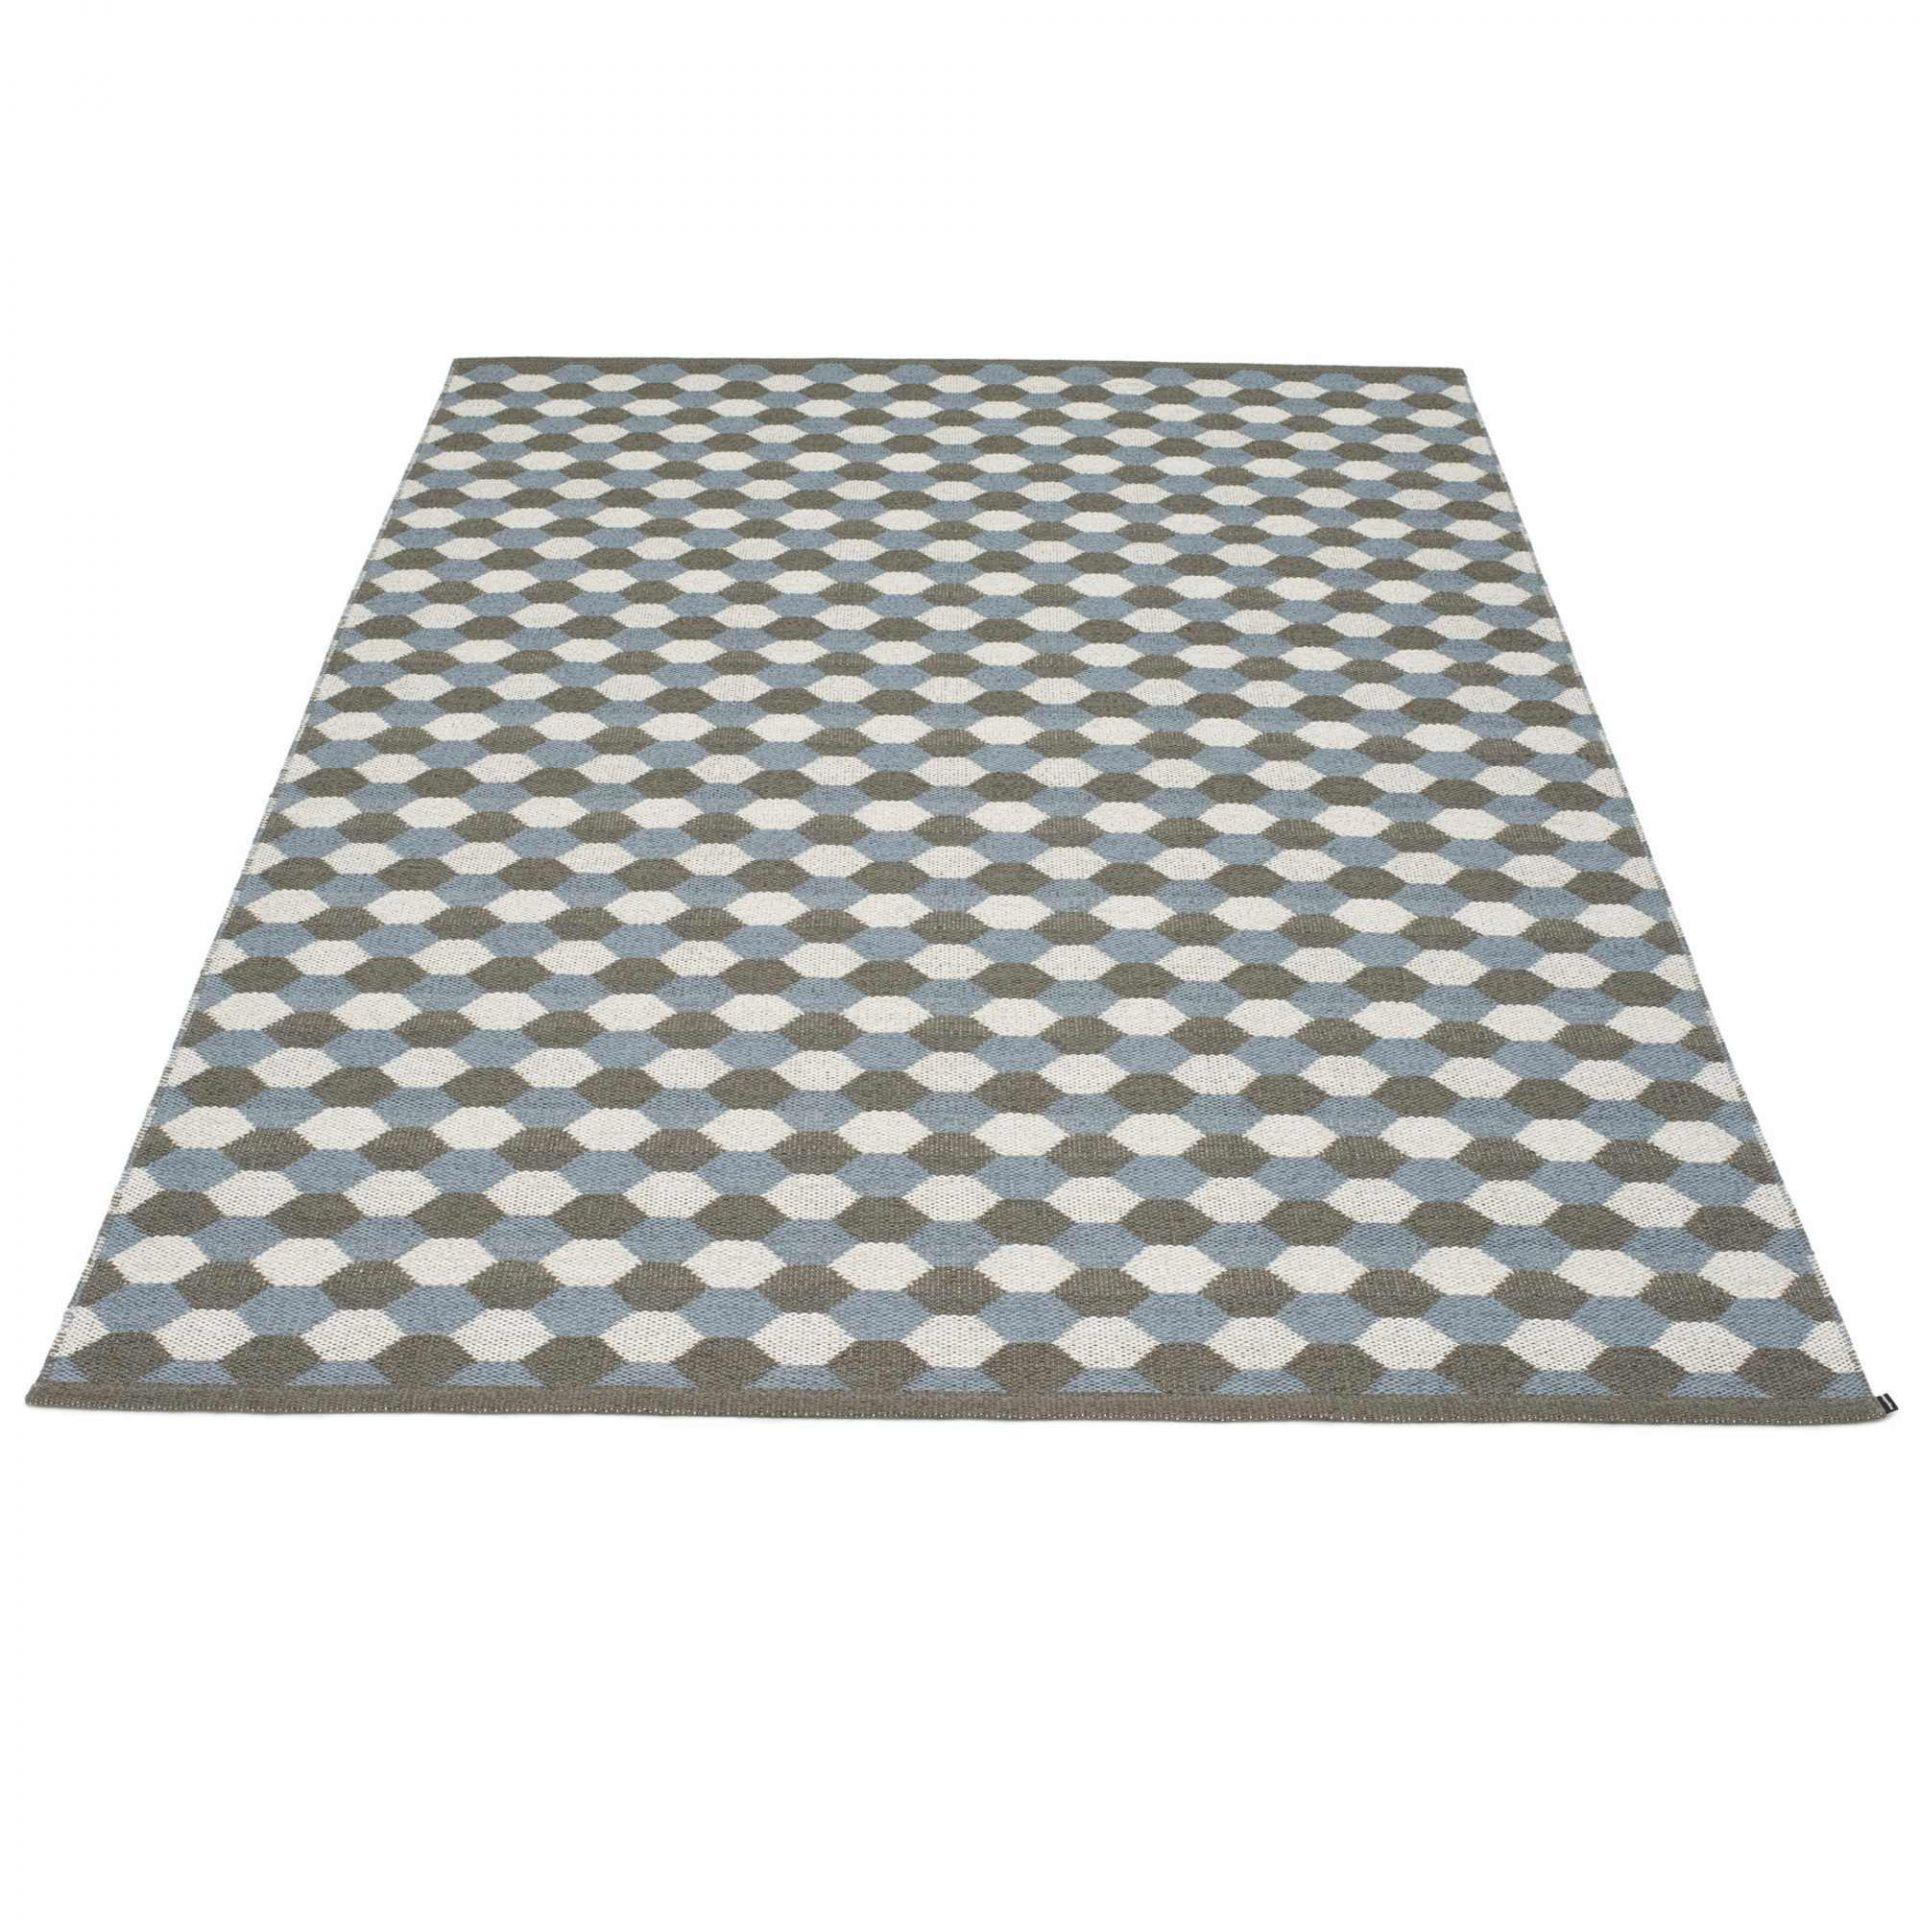 Dana Kunststoffteppich 70x100 sturm Pappelina